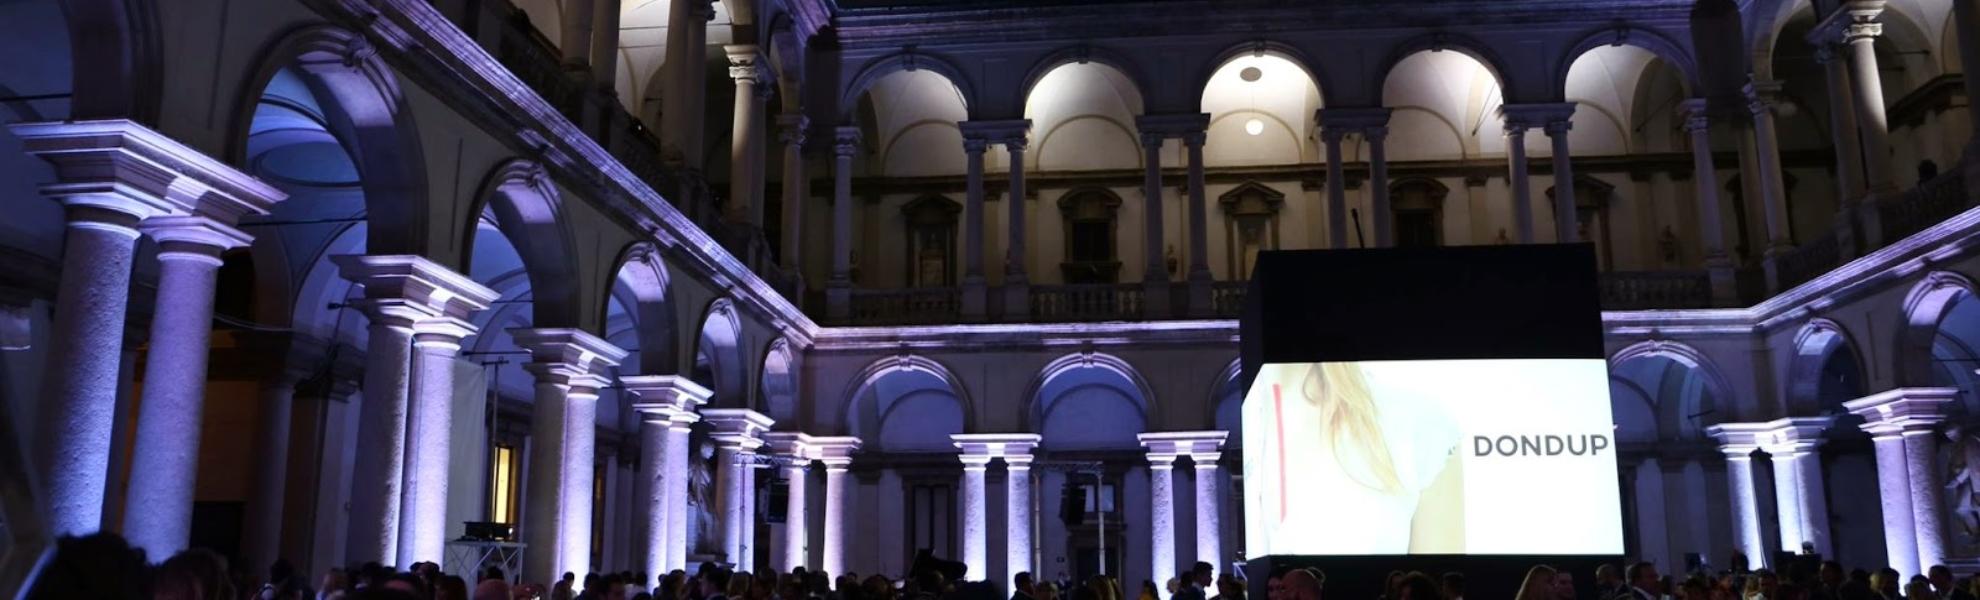 DONDUP Pinacoteca di Brera Milano